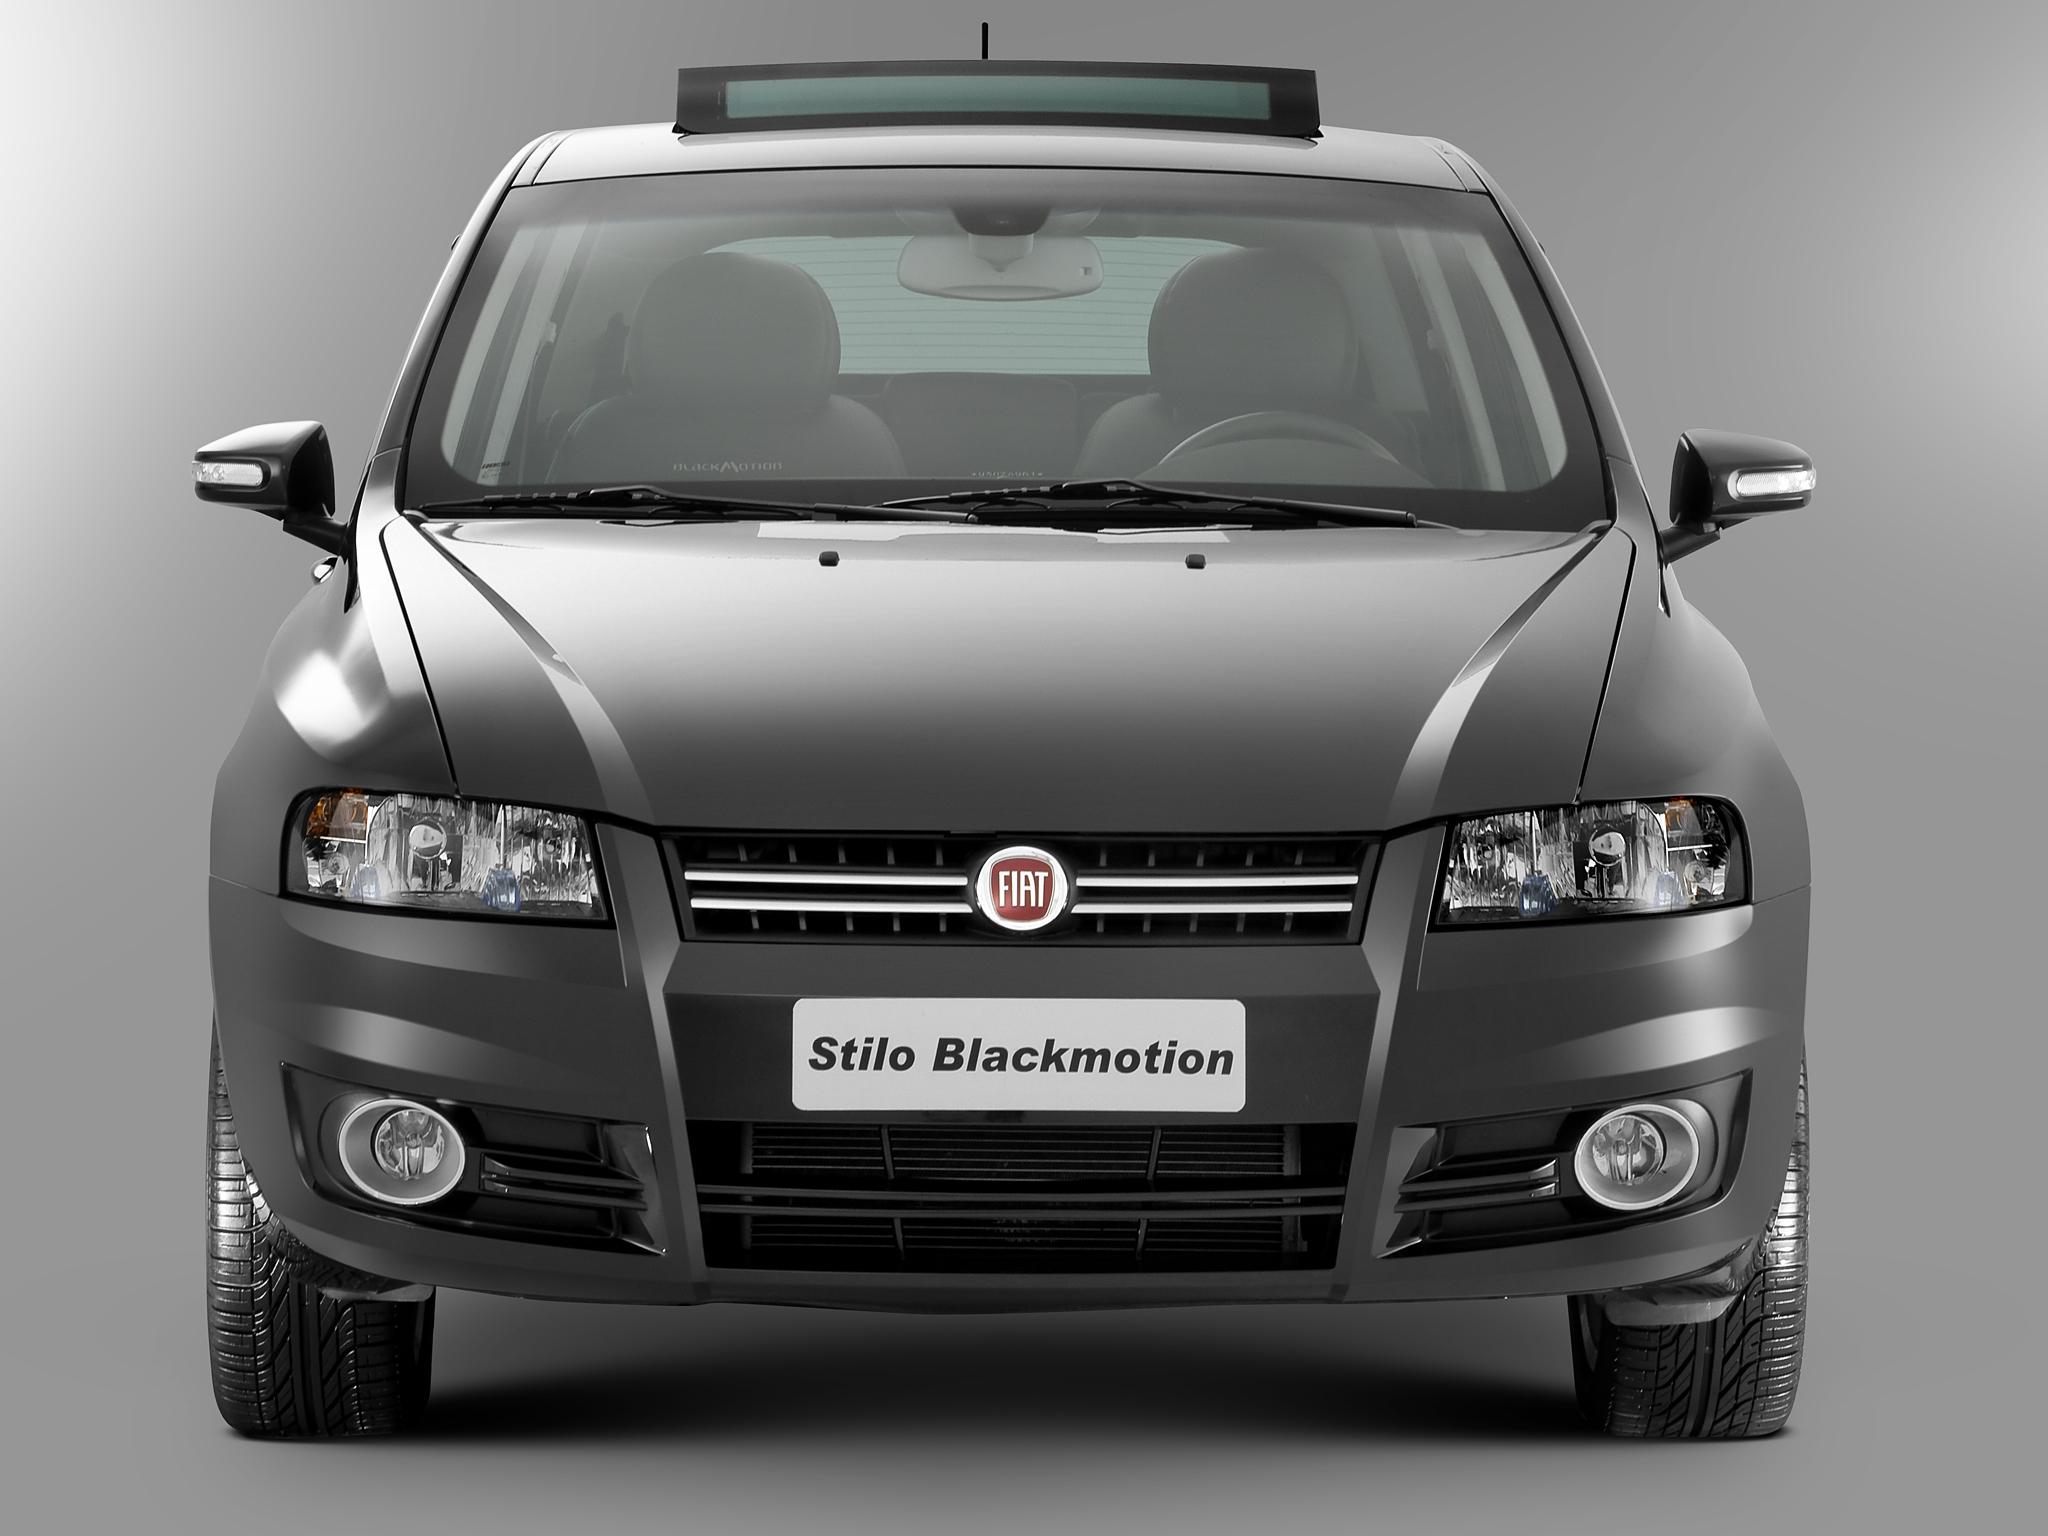 Fiat Stilo Photos Photogallery With 14 Pics Carsbase Com